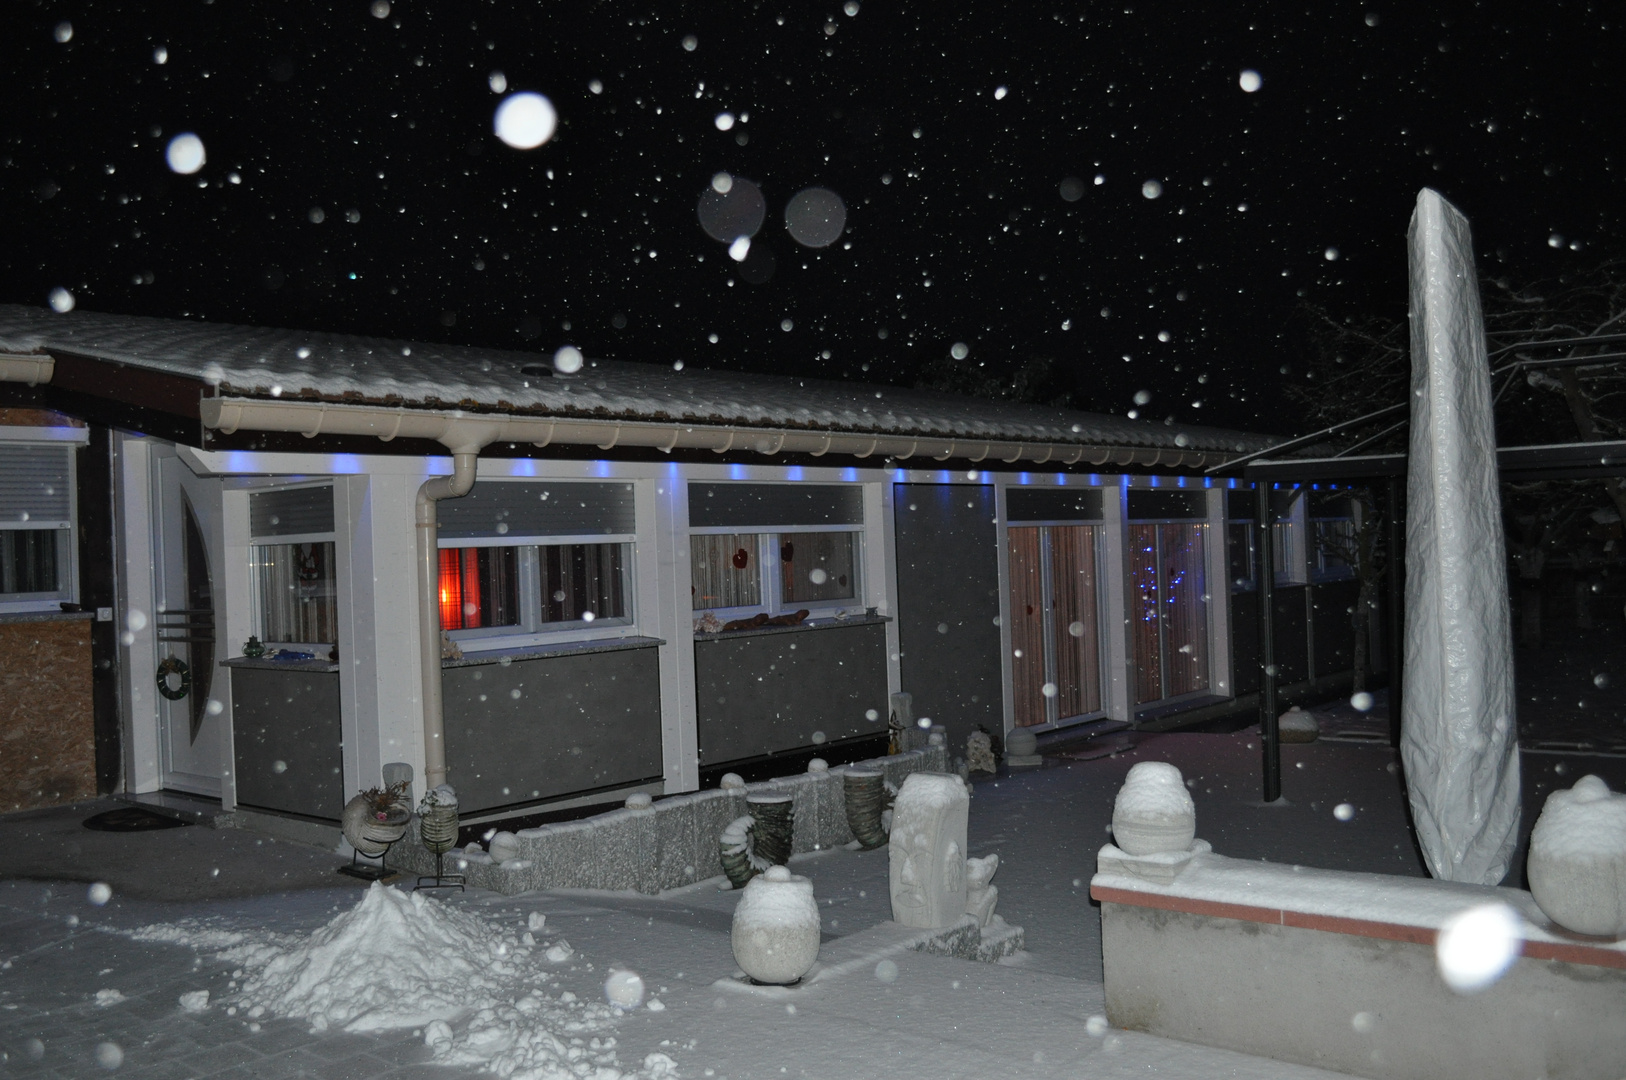 un soir de décembre en Alsace